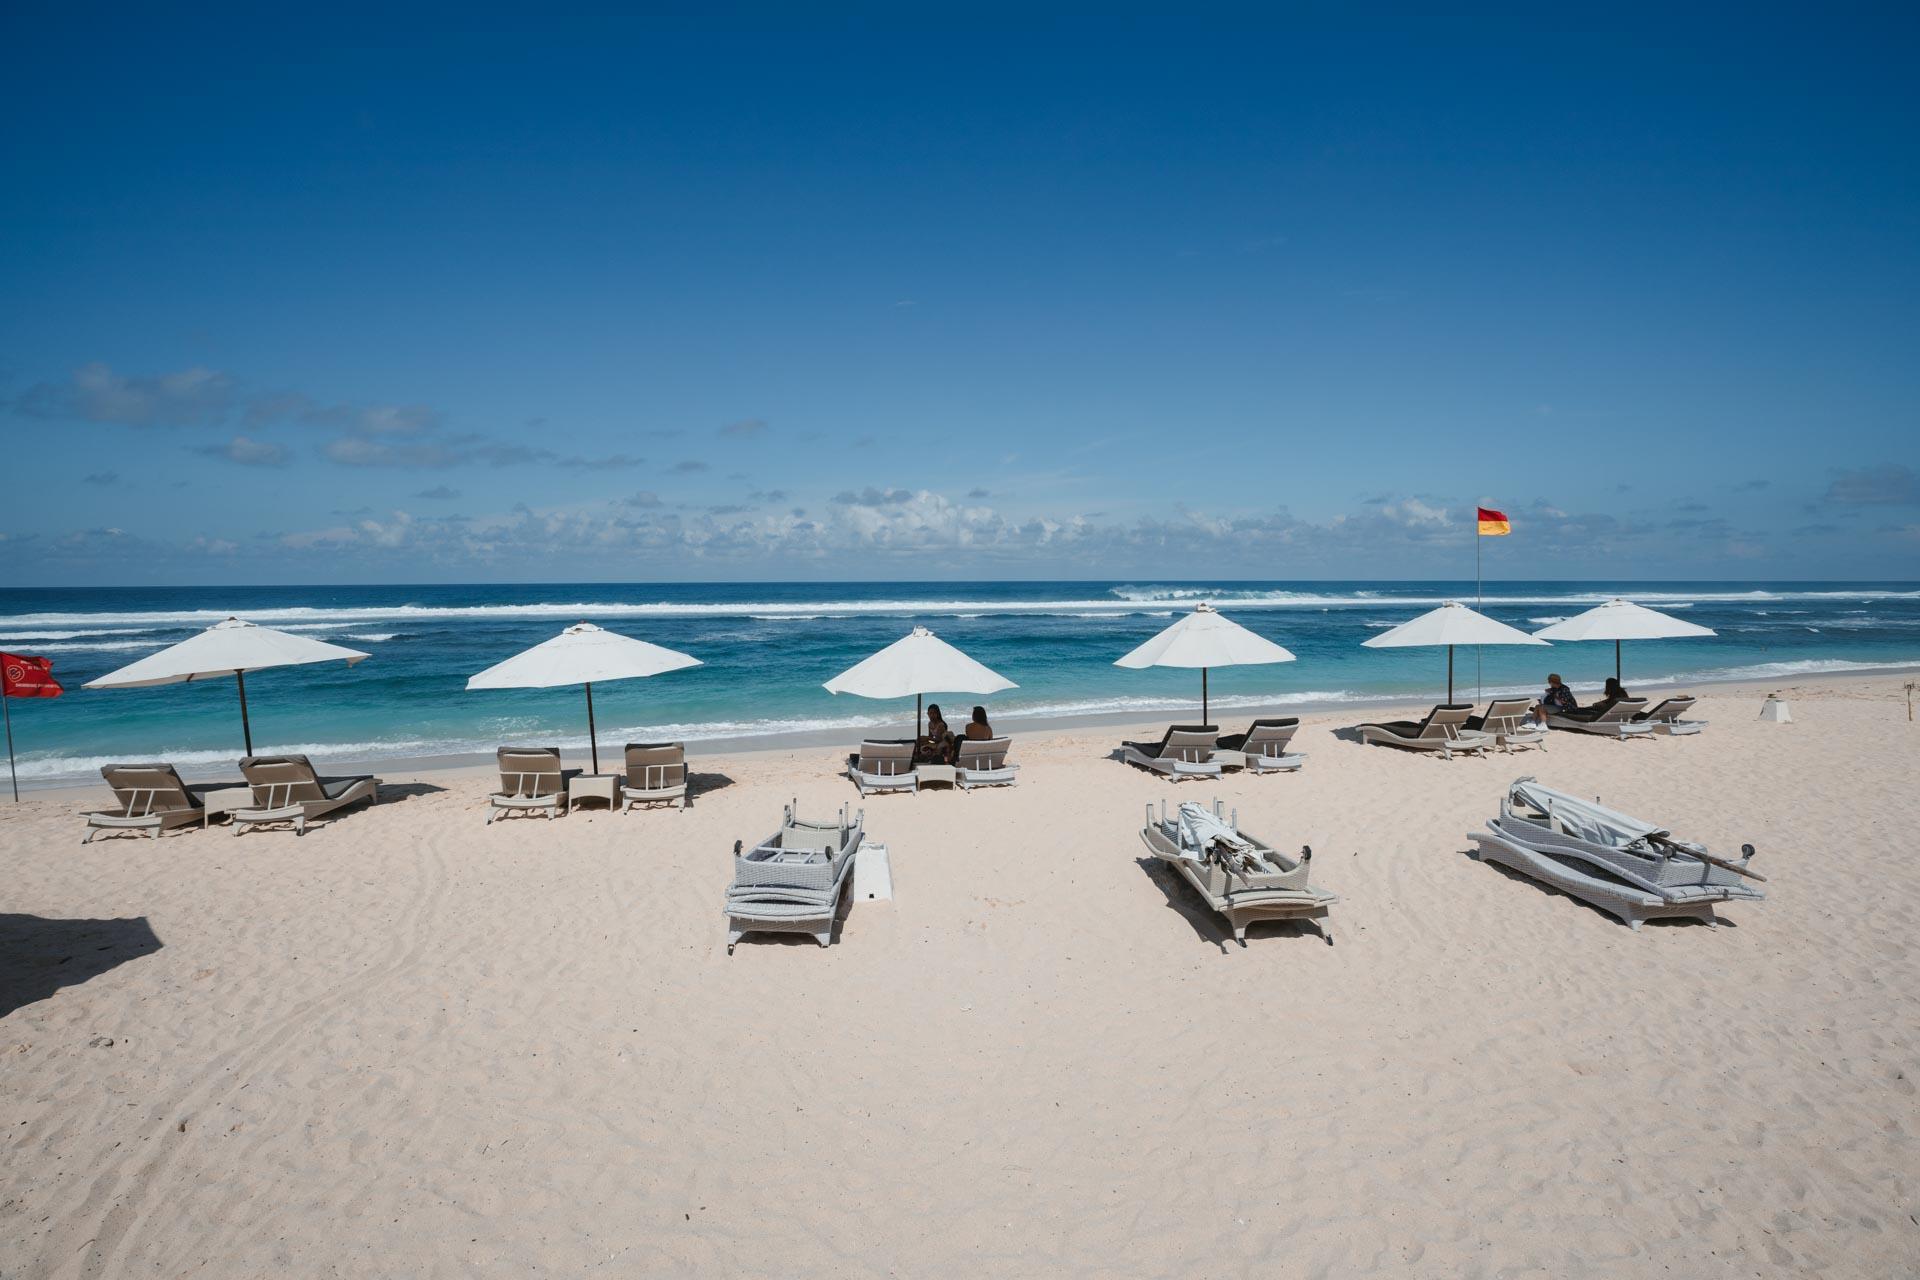 melasti beach, pantai melasti, melasti beach bali, pantai melasti bali, melasti bali